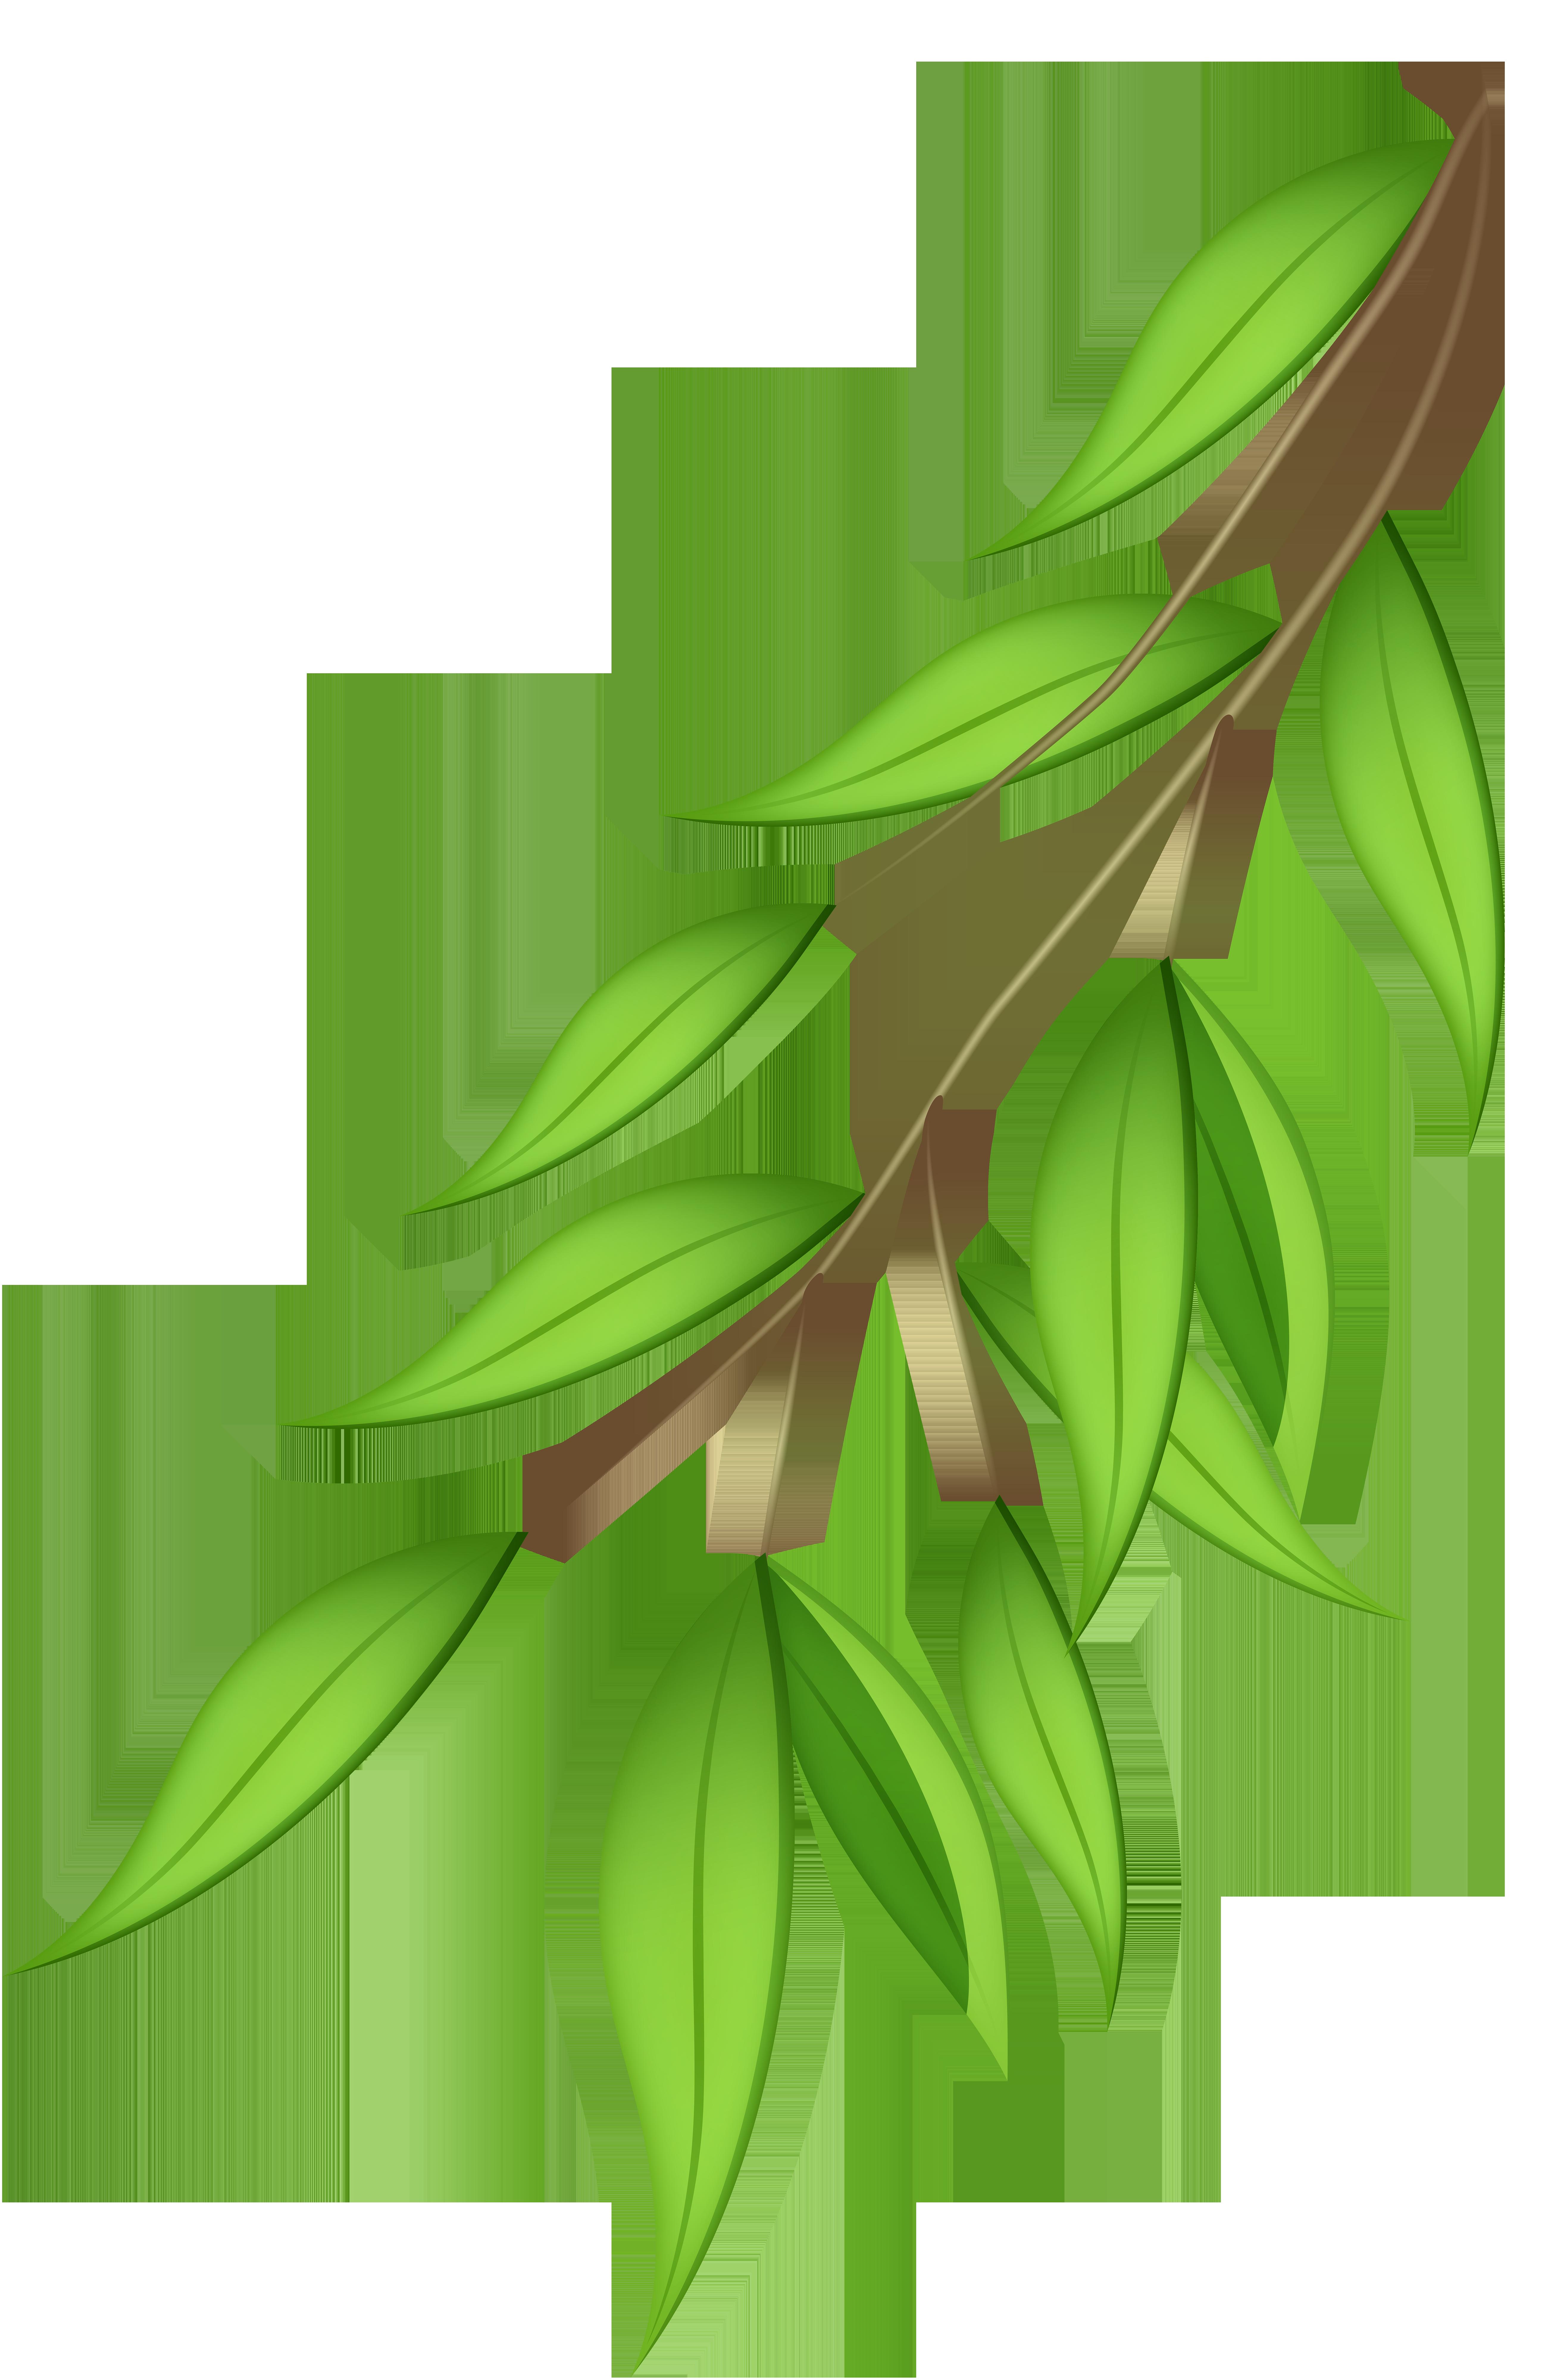 Green Branch PNG Transparent Clip Art Image.